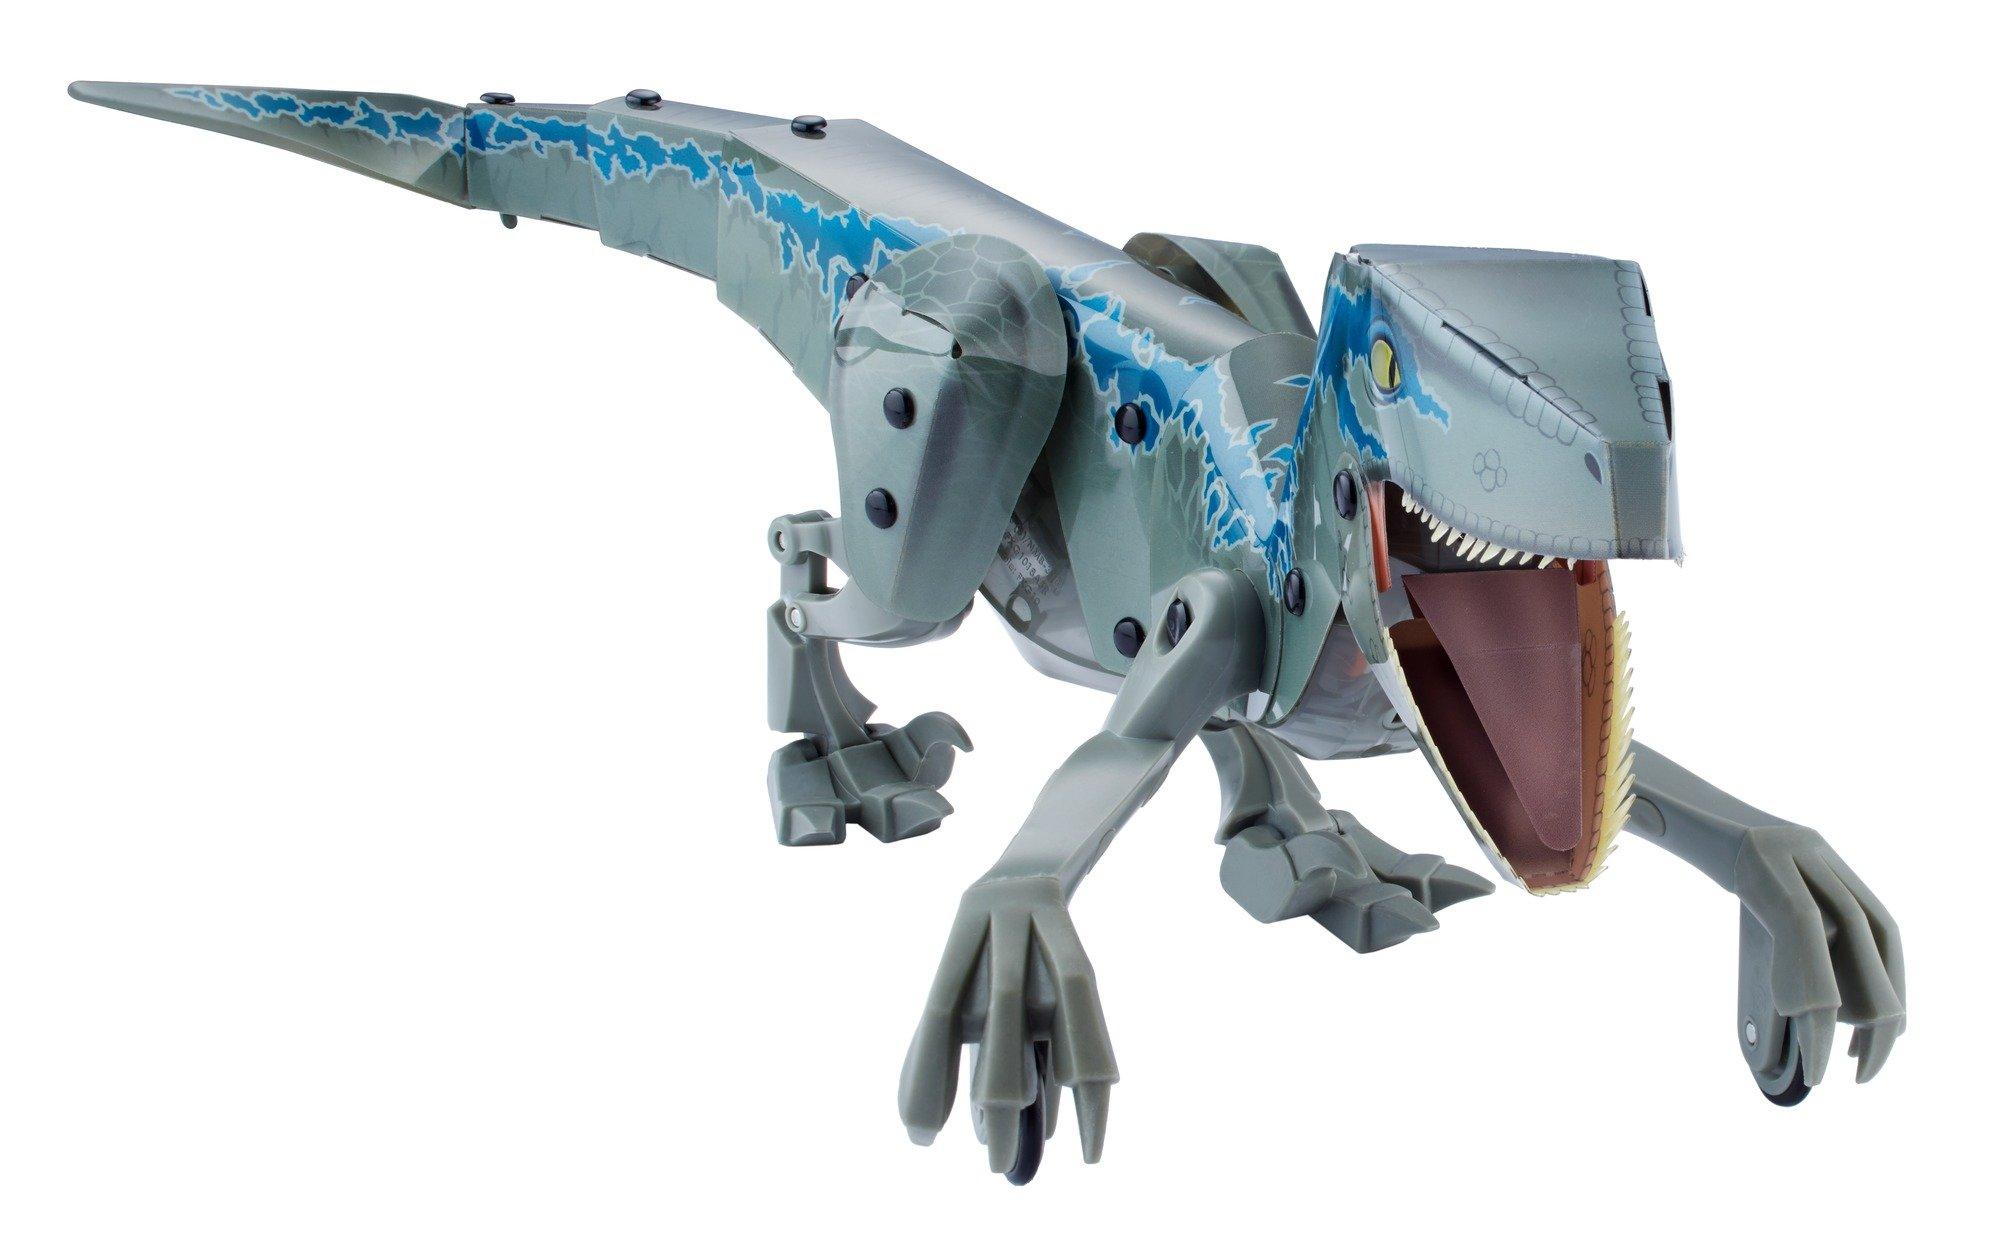 Kamigami Jurassic World Blue Robot by Jurassic World Toys (Image #13)